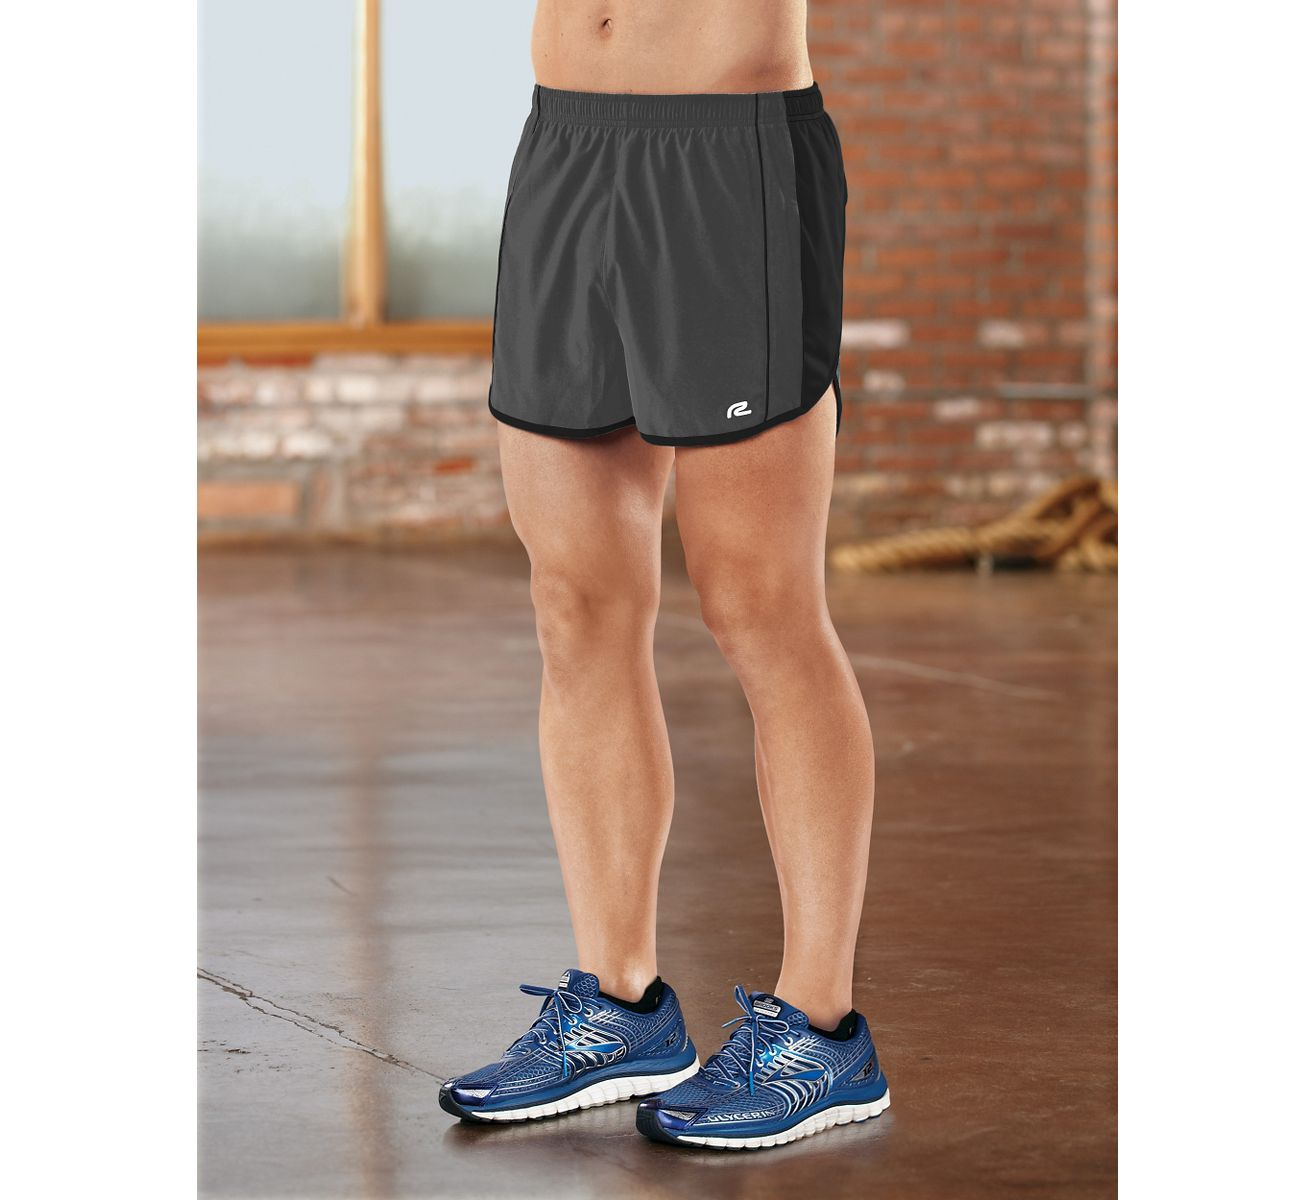 nike mens running shorts sale